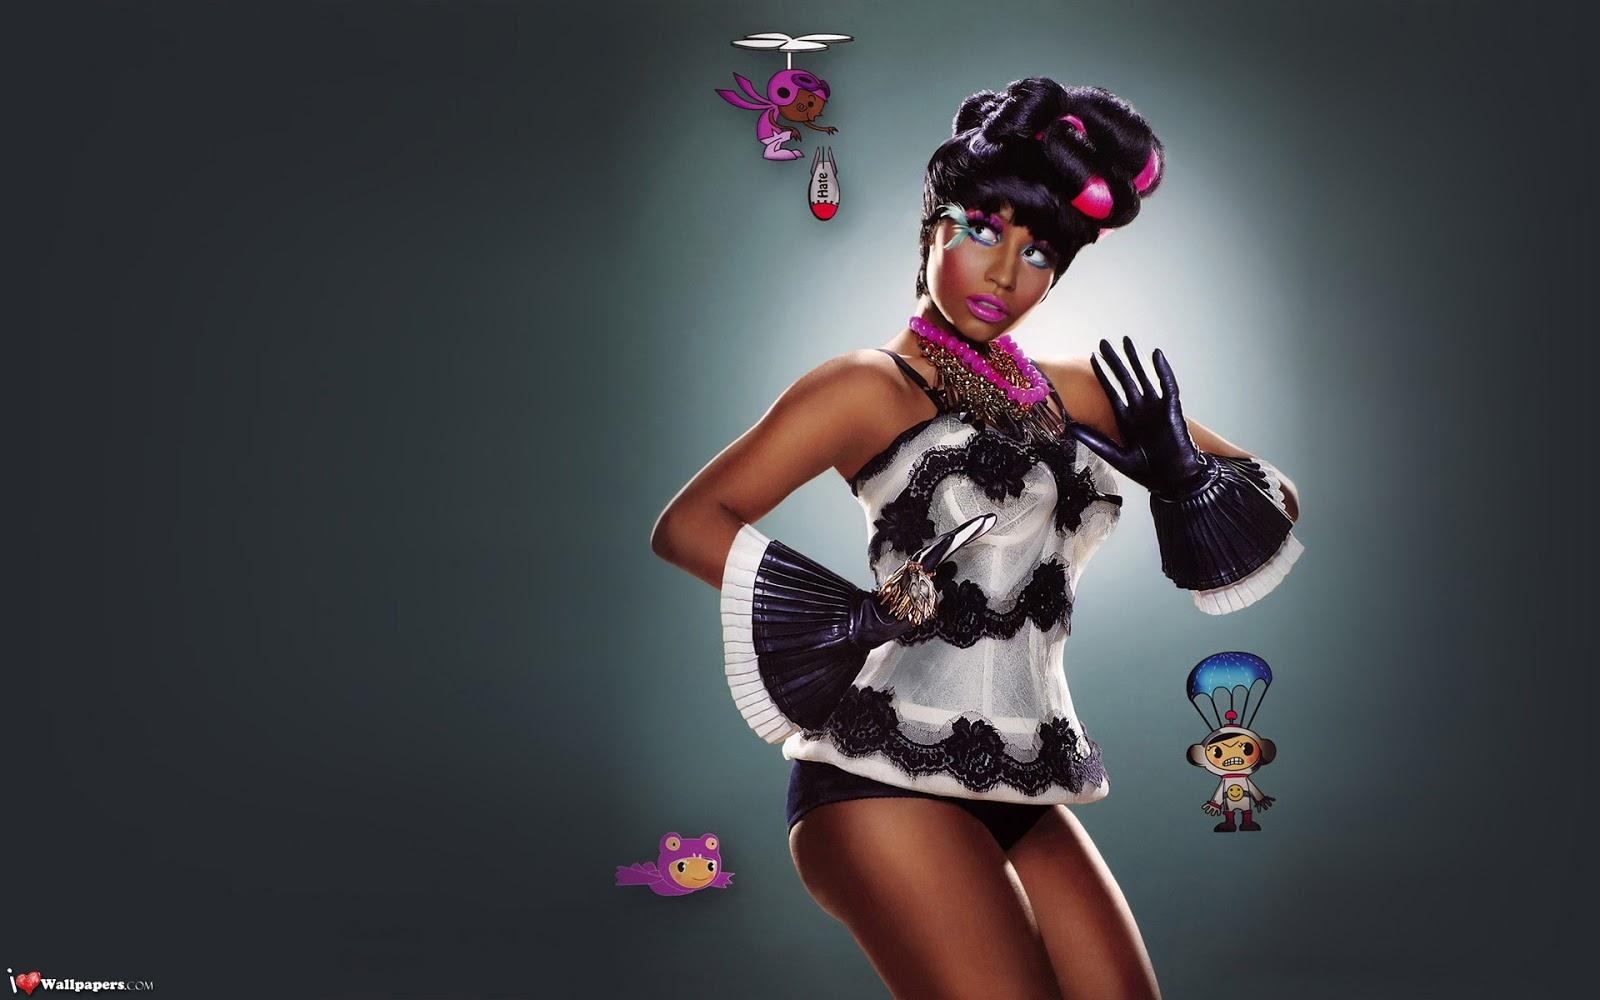 Nicki Minajs Sexiest Photos Top 10 on Latest Writing On The Wall 3